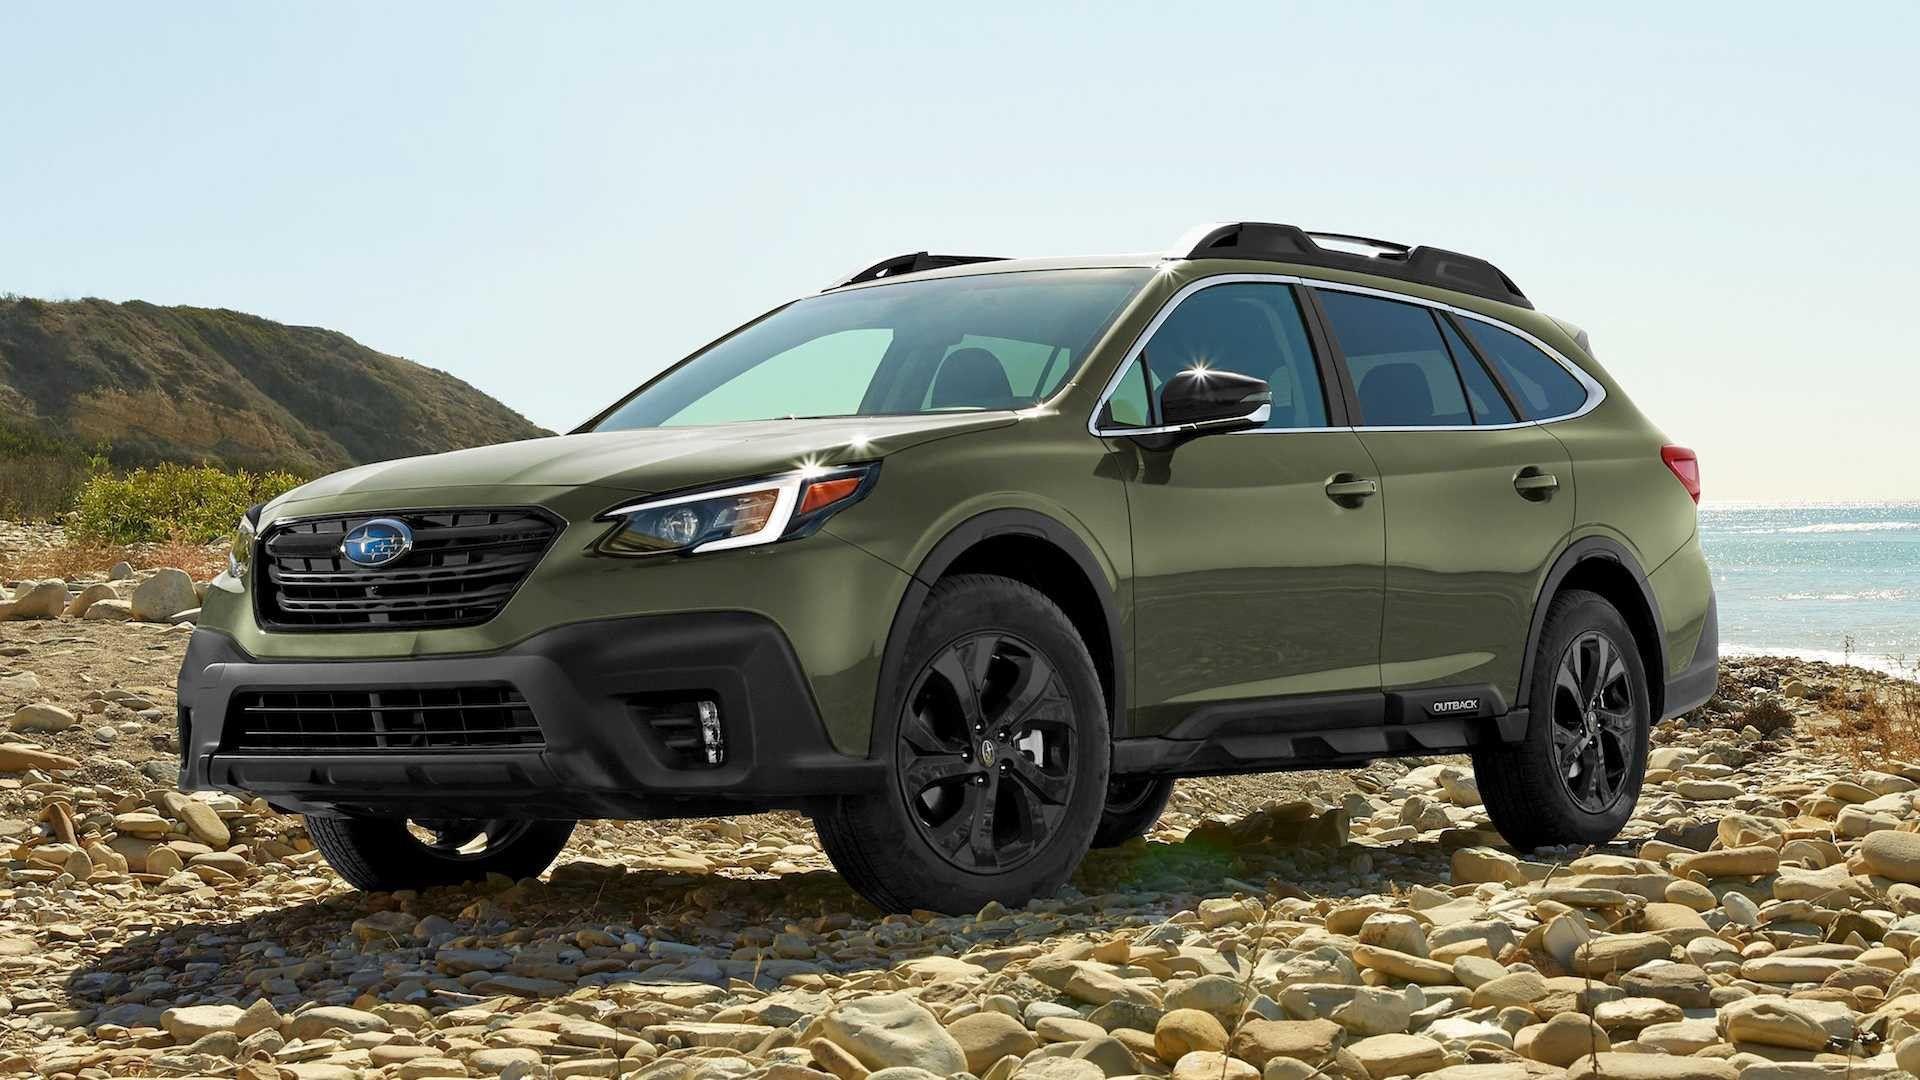 2020 Subaru Outback Global Platform Review in 2020